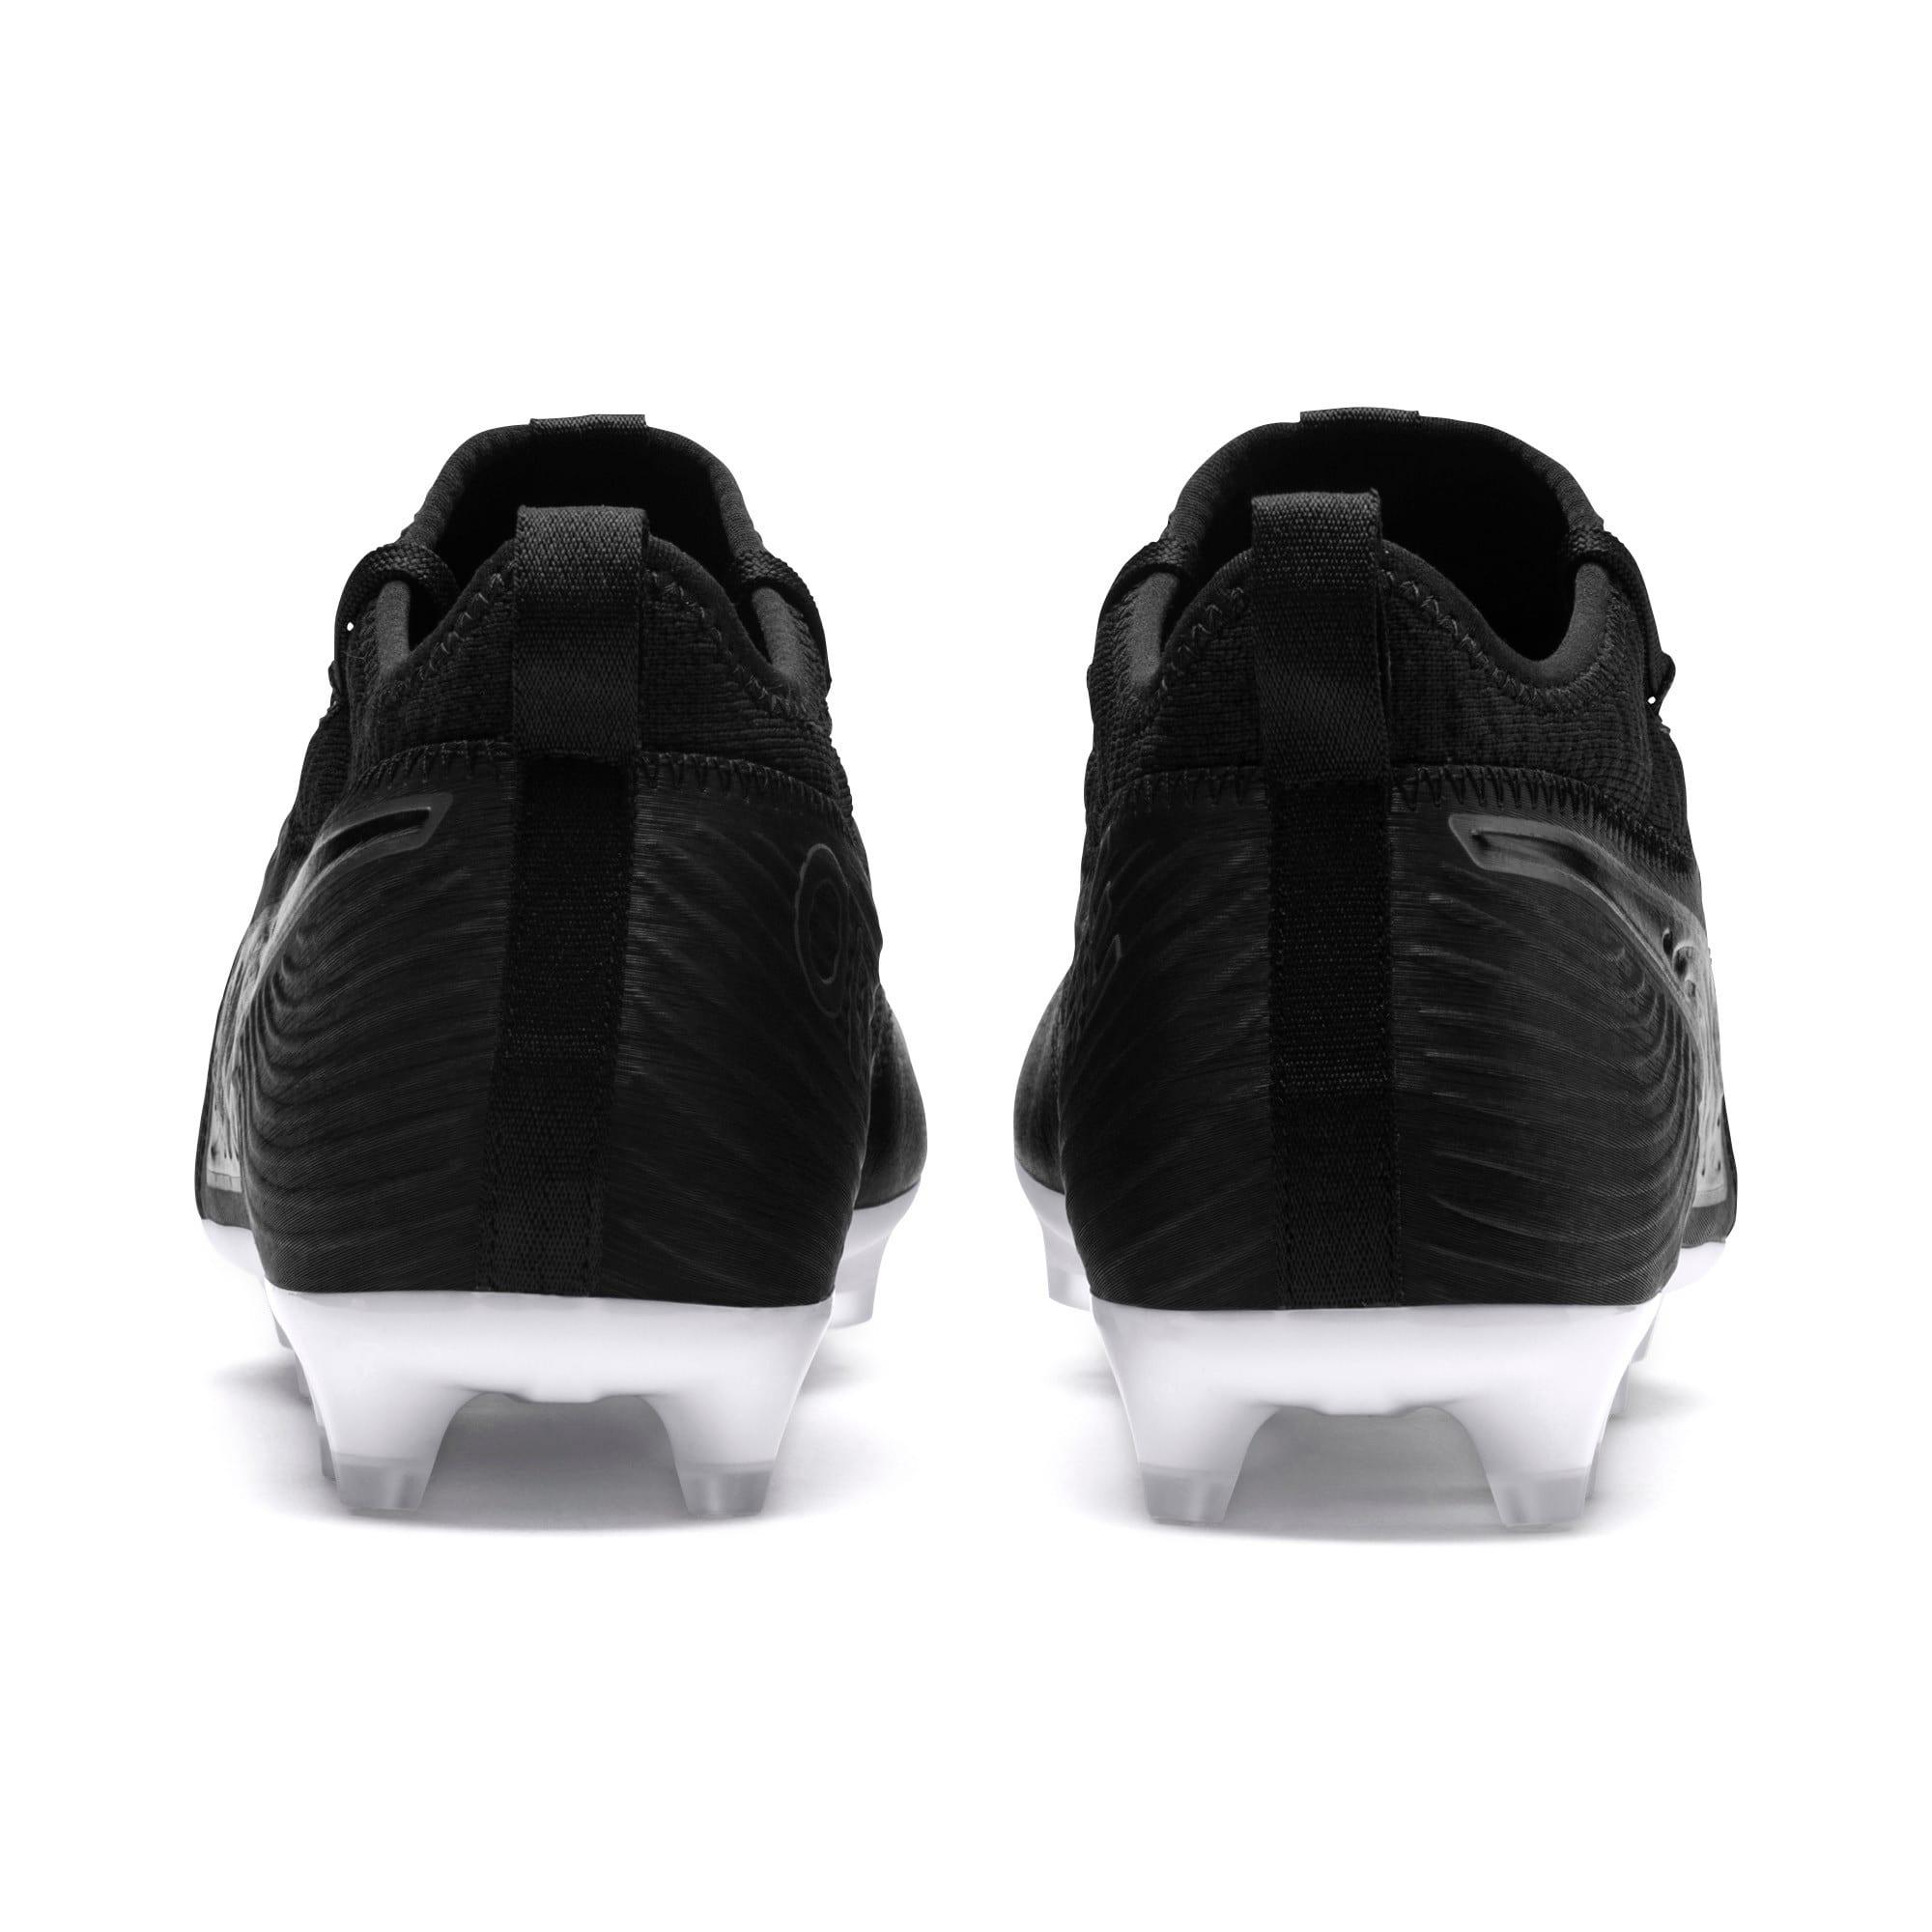 Thumbnail 3 of PUMA ONE 19.3 FG/AG Men's Soccer Cleats, Puma Black-Puma Black-White, medium